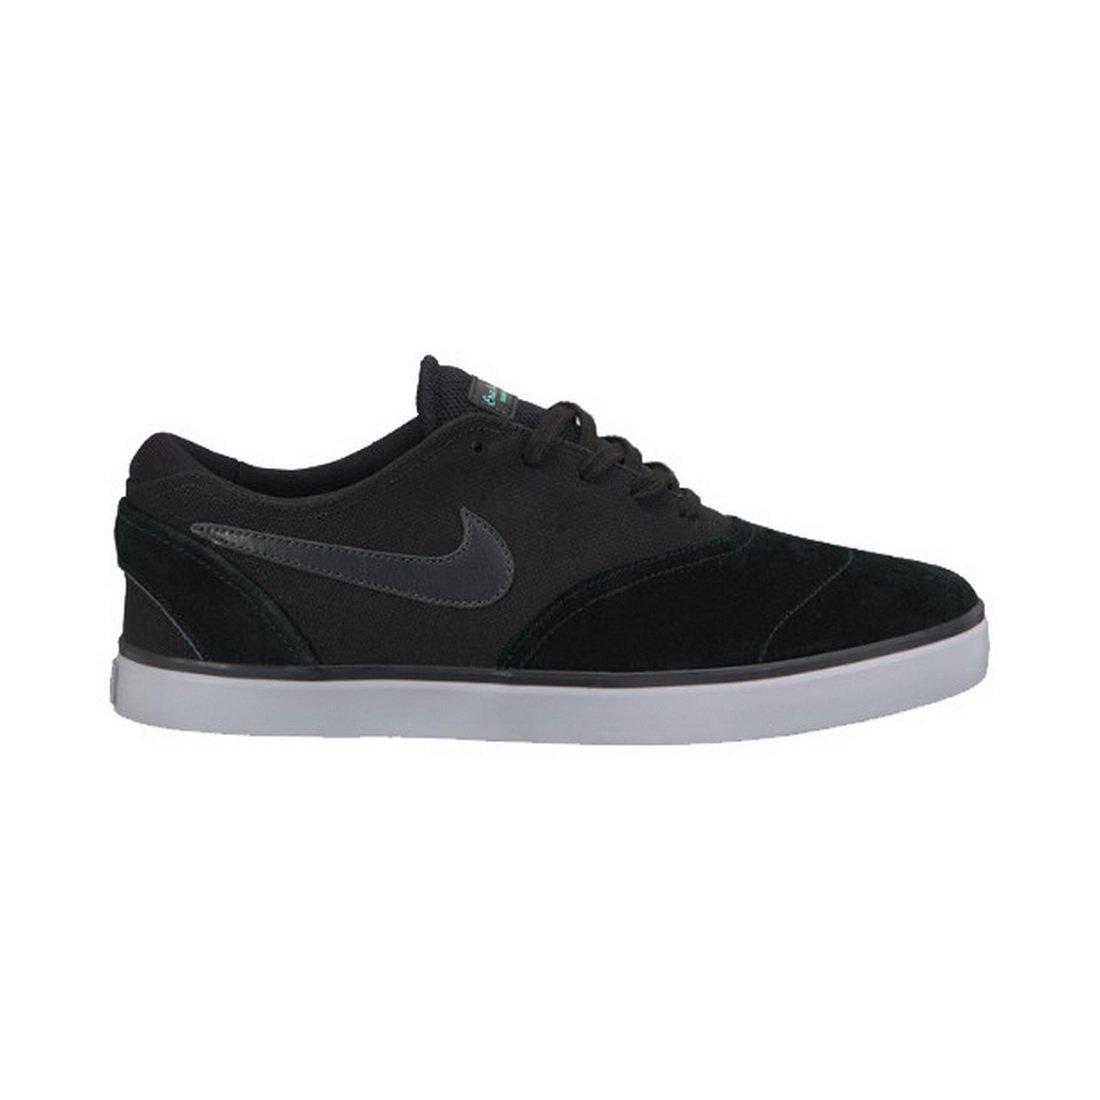 Nike Men's Eric Koston 2 LR Skateboarding Shoes